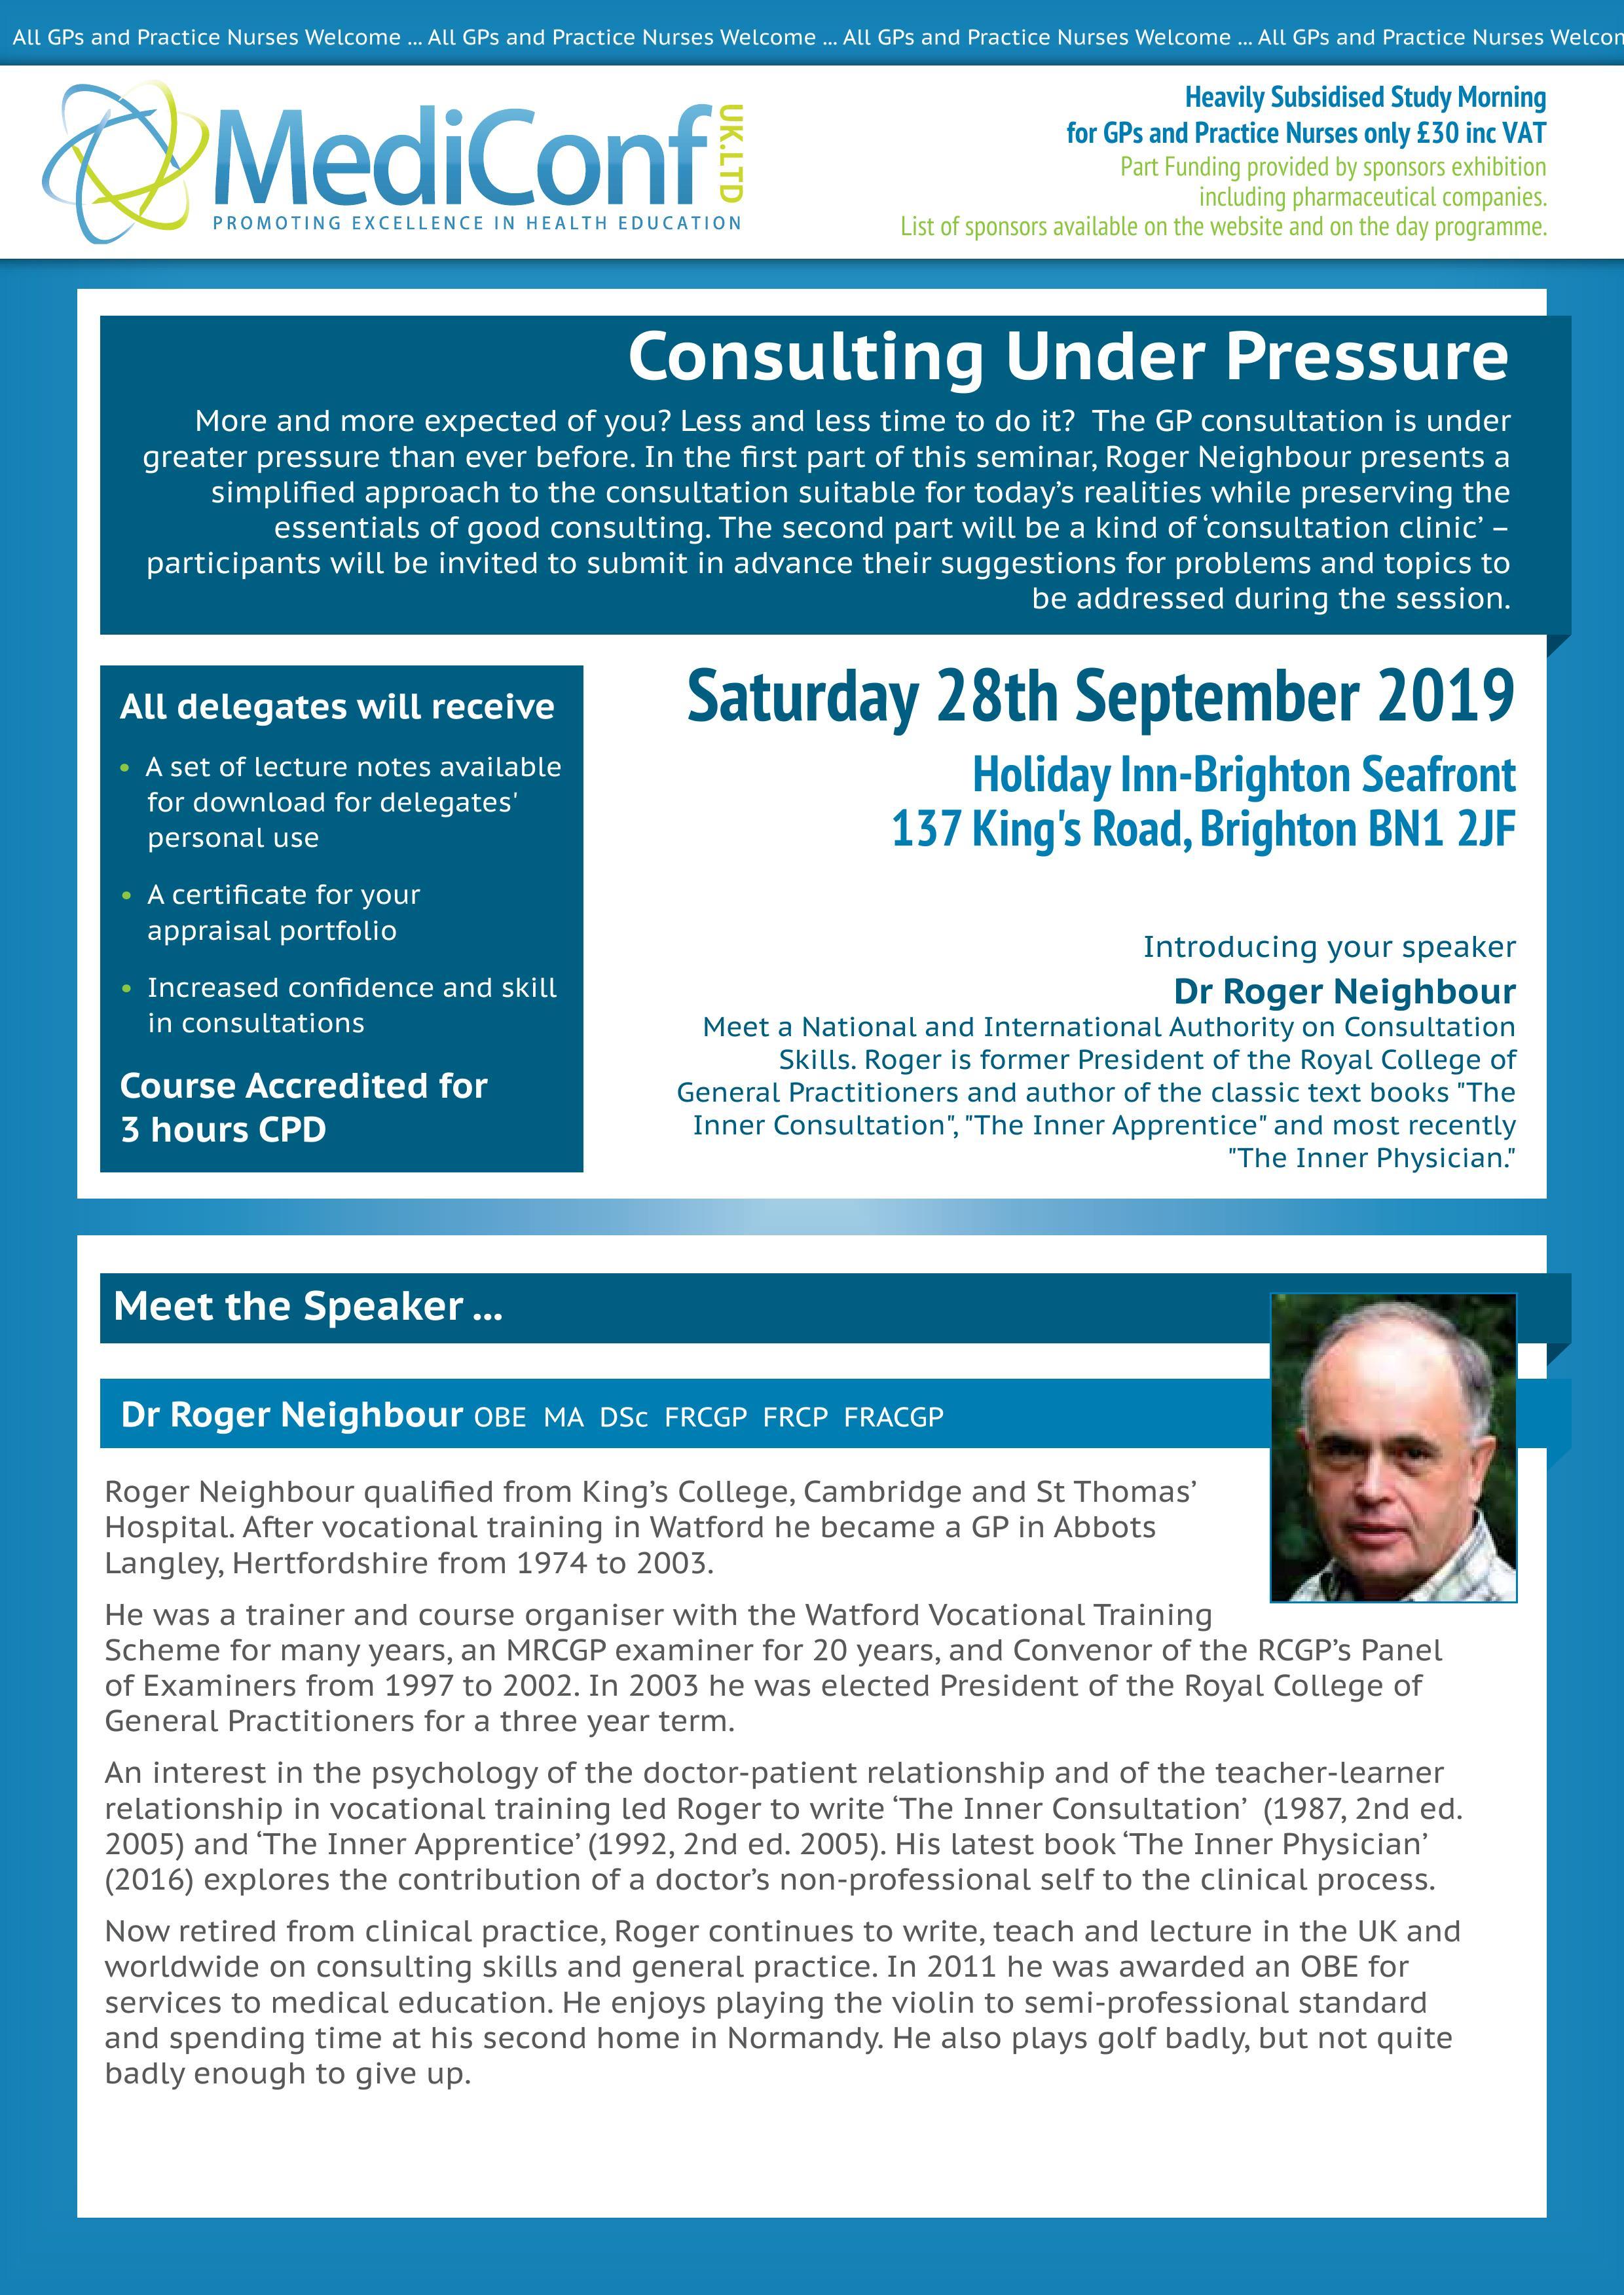 Consultation Skills: Consulting Under Pressure - 28 September 2019